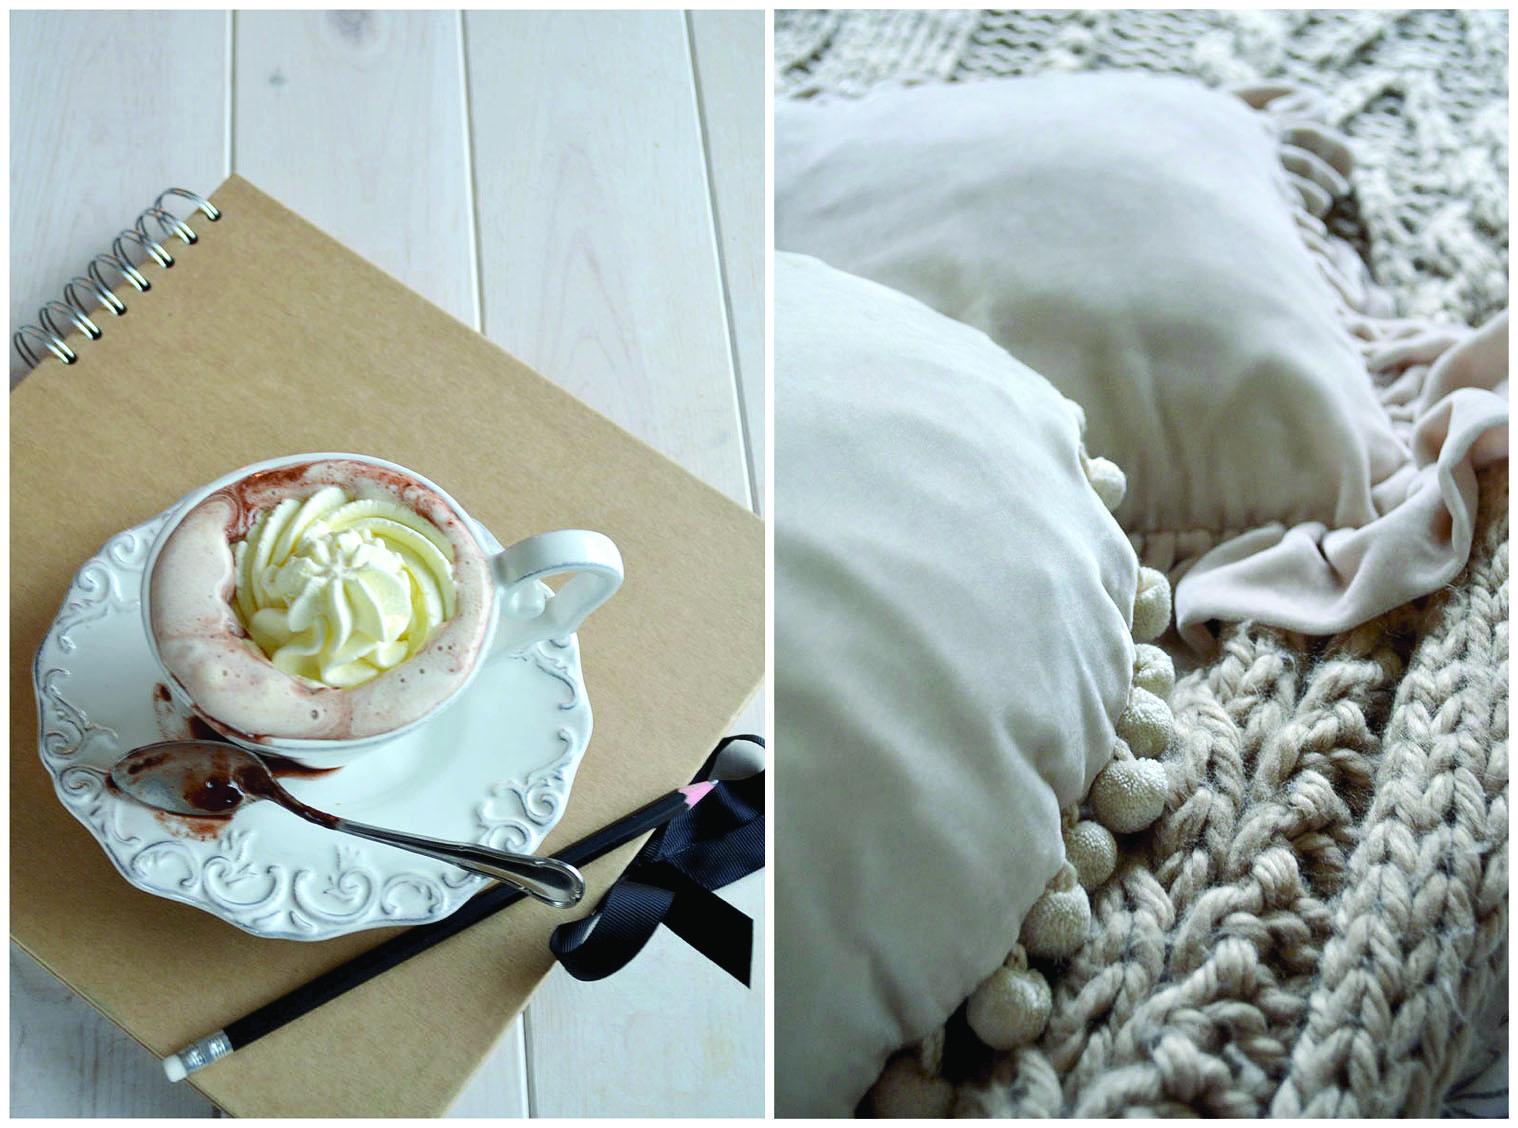 Hot Chocolate and woolly blanket.jpg